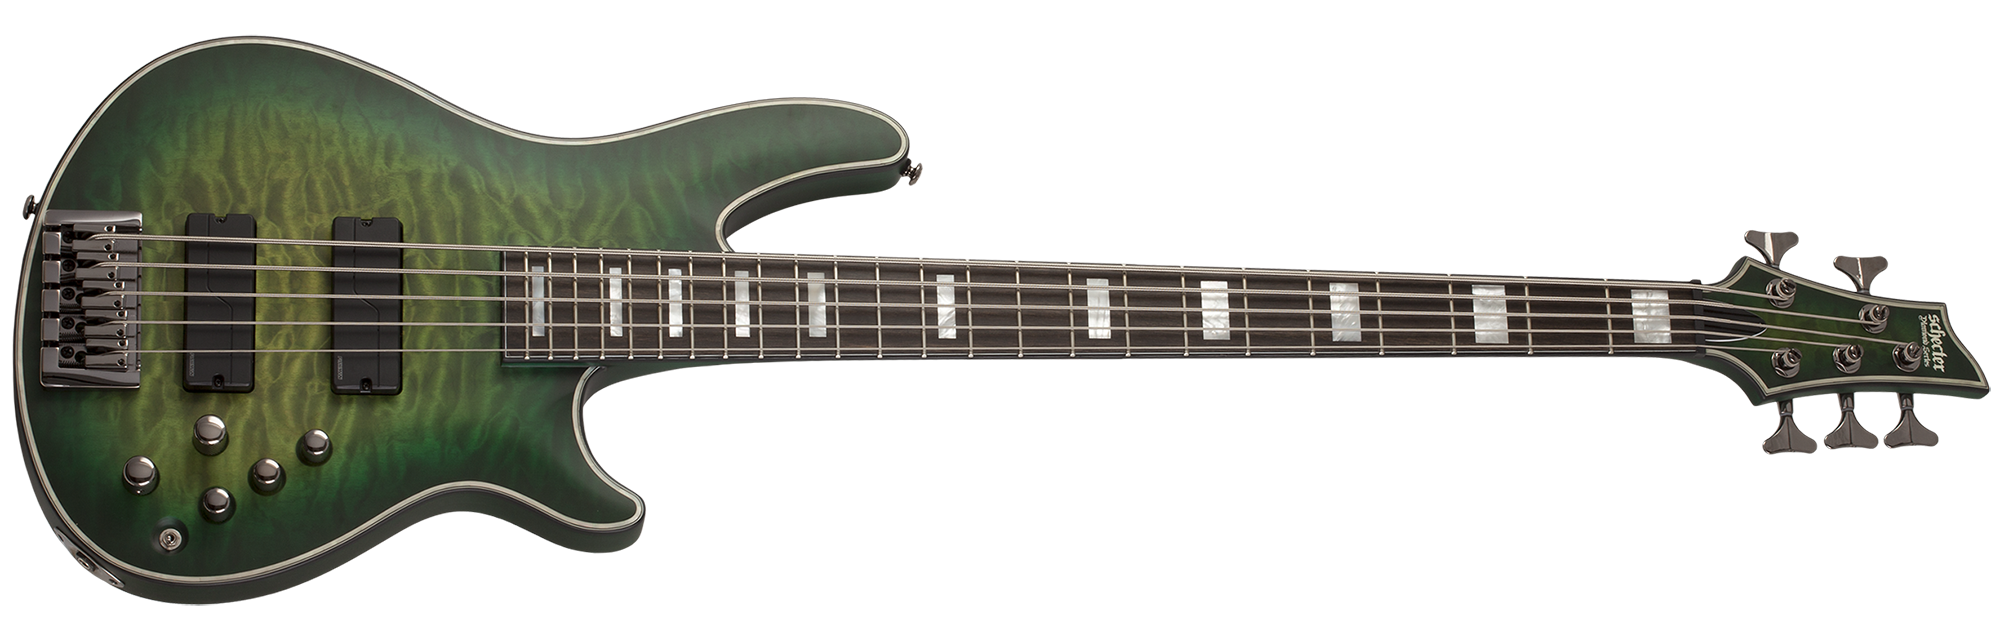 Daniel Firth Hellraiser Extreme-5 Signature Bass